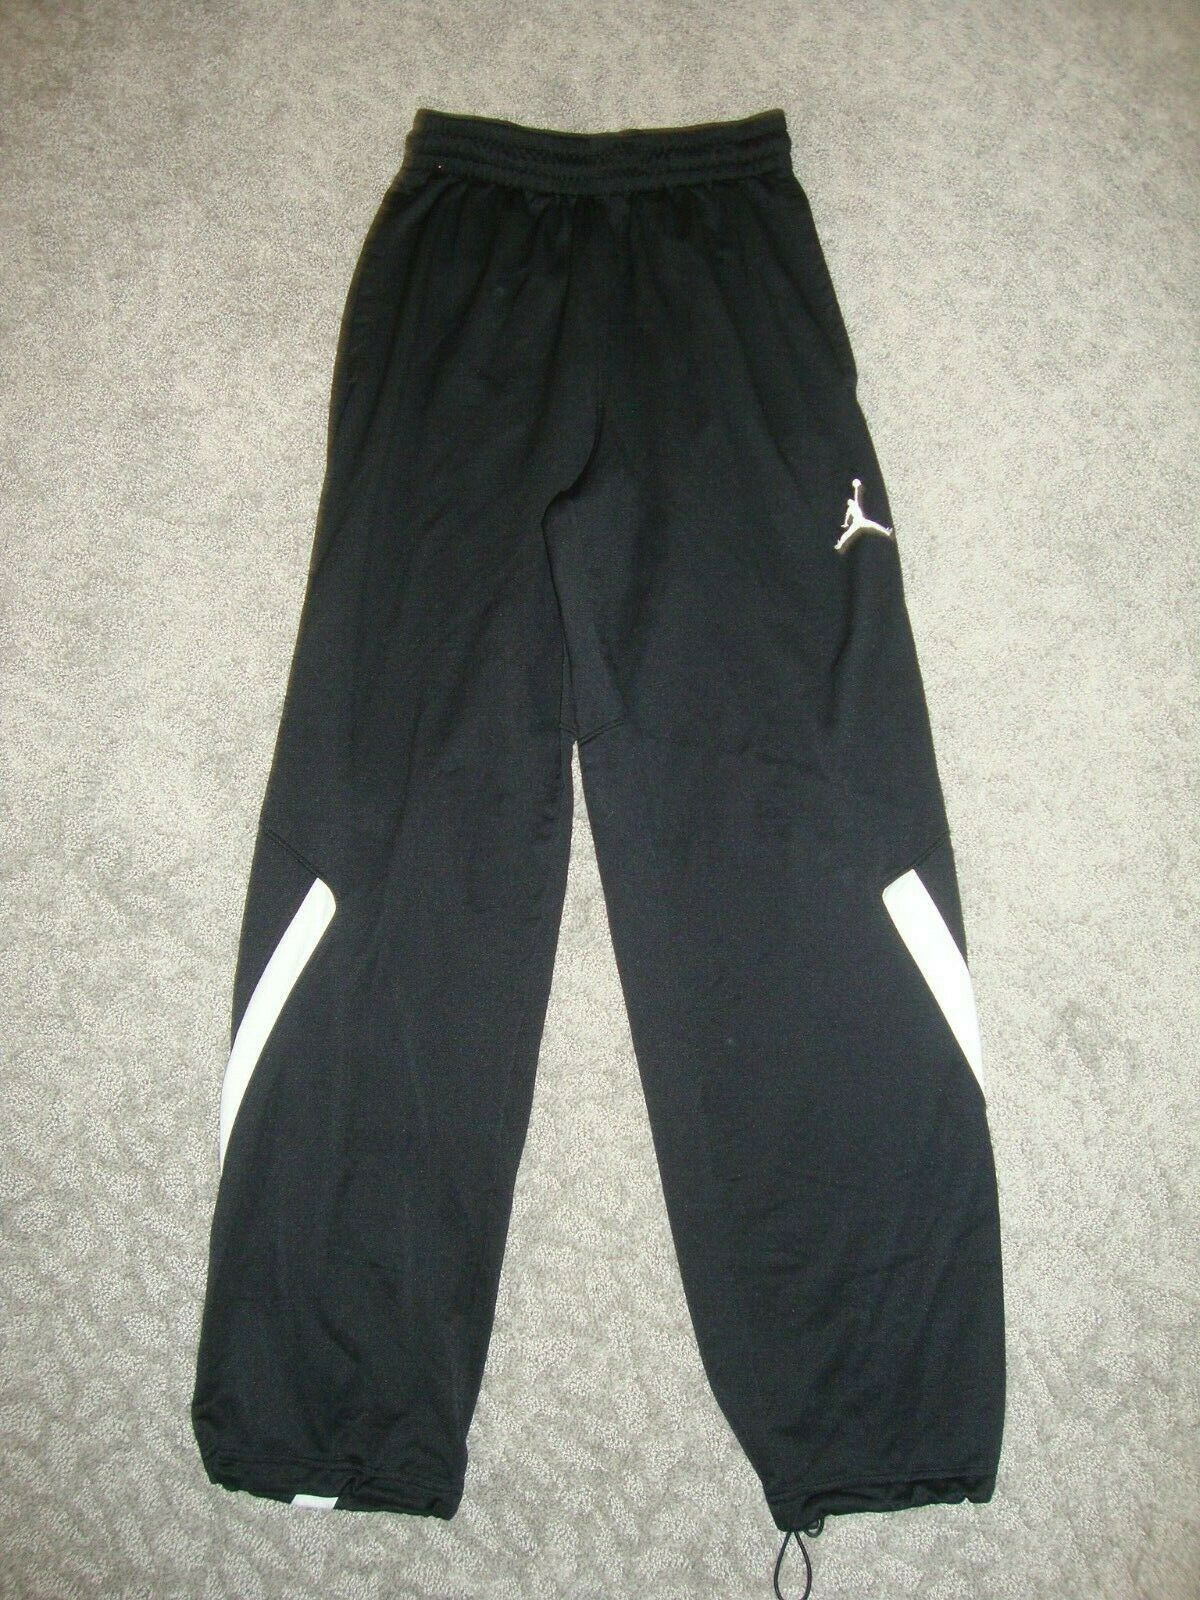 Jordan Jumpman Track Warm up Pants